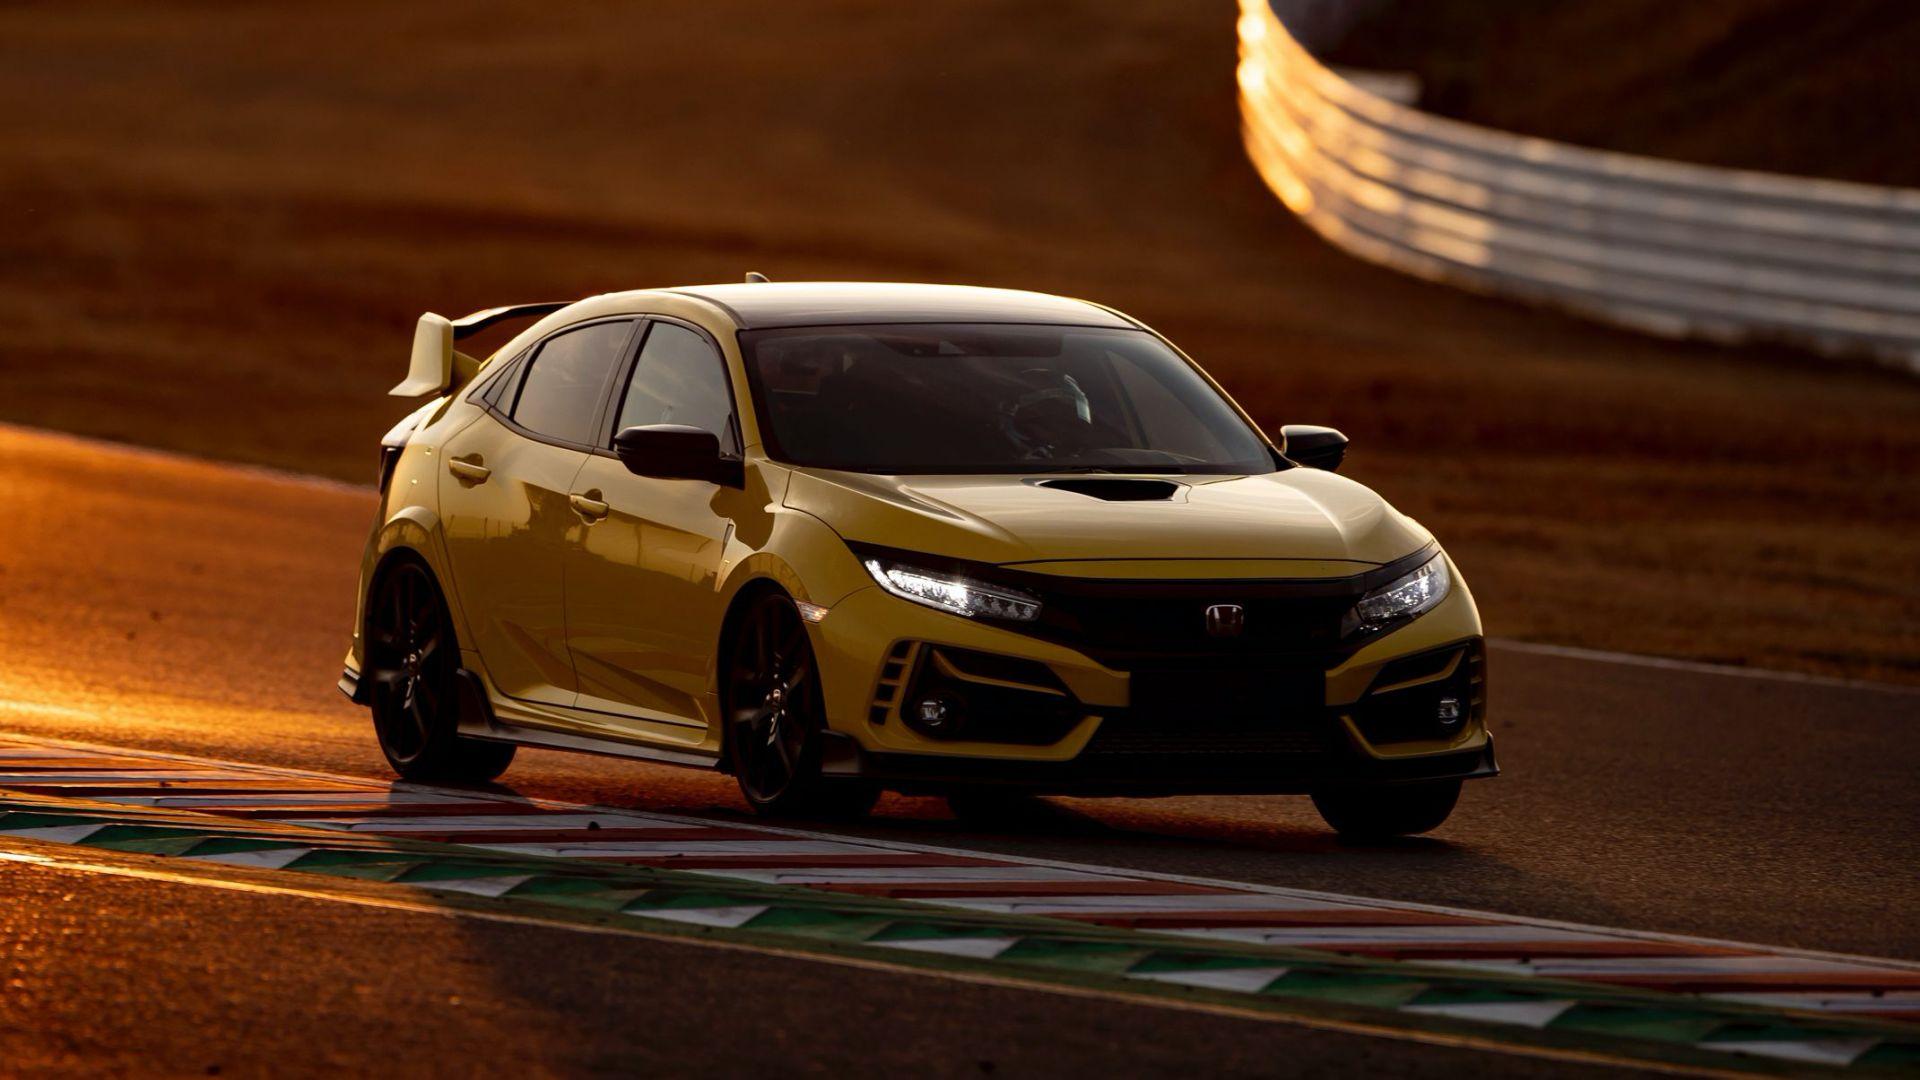 Honda Civic Type R Limited Edition sets new Suzuka lap record 1